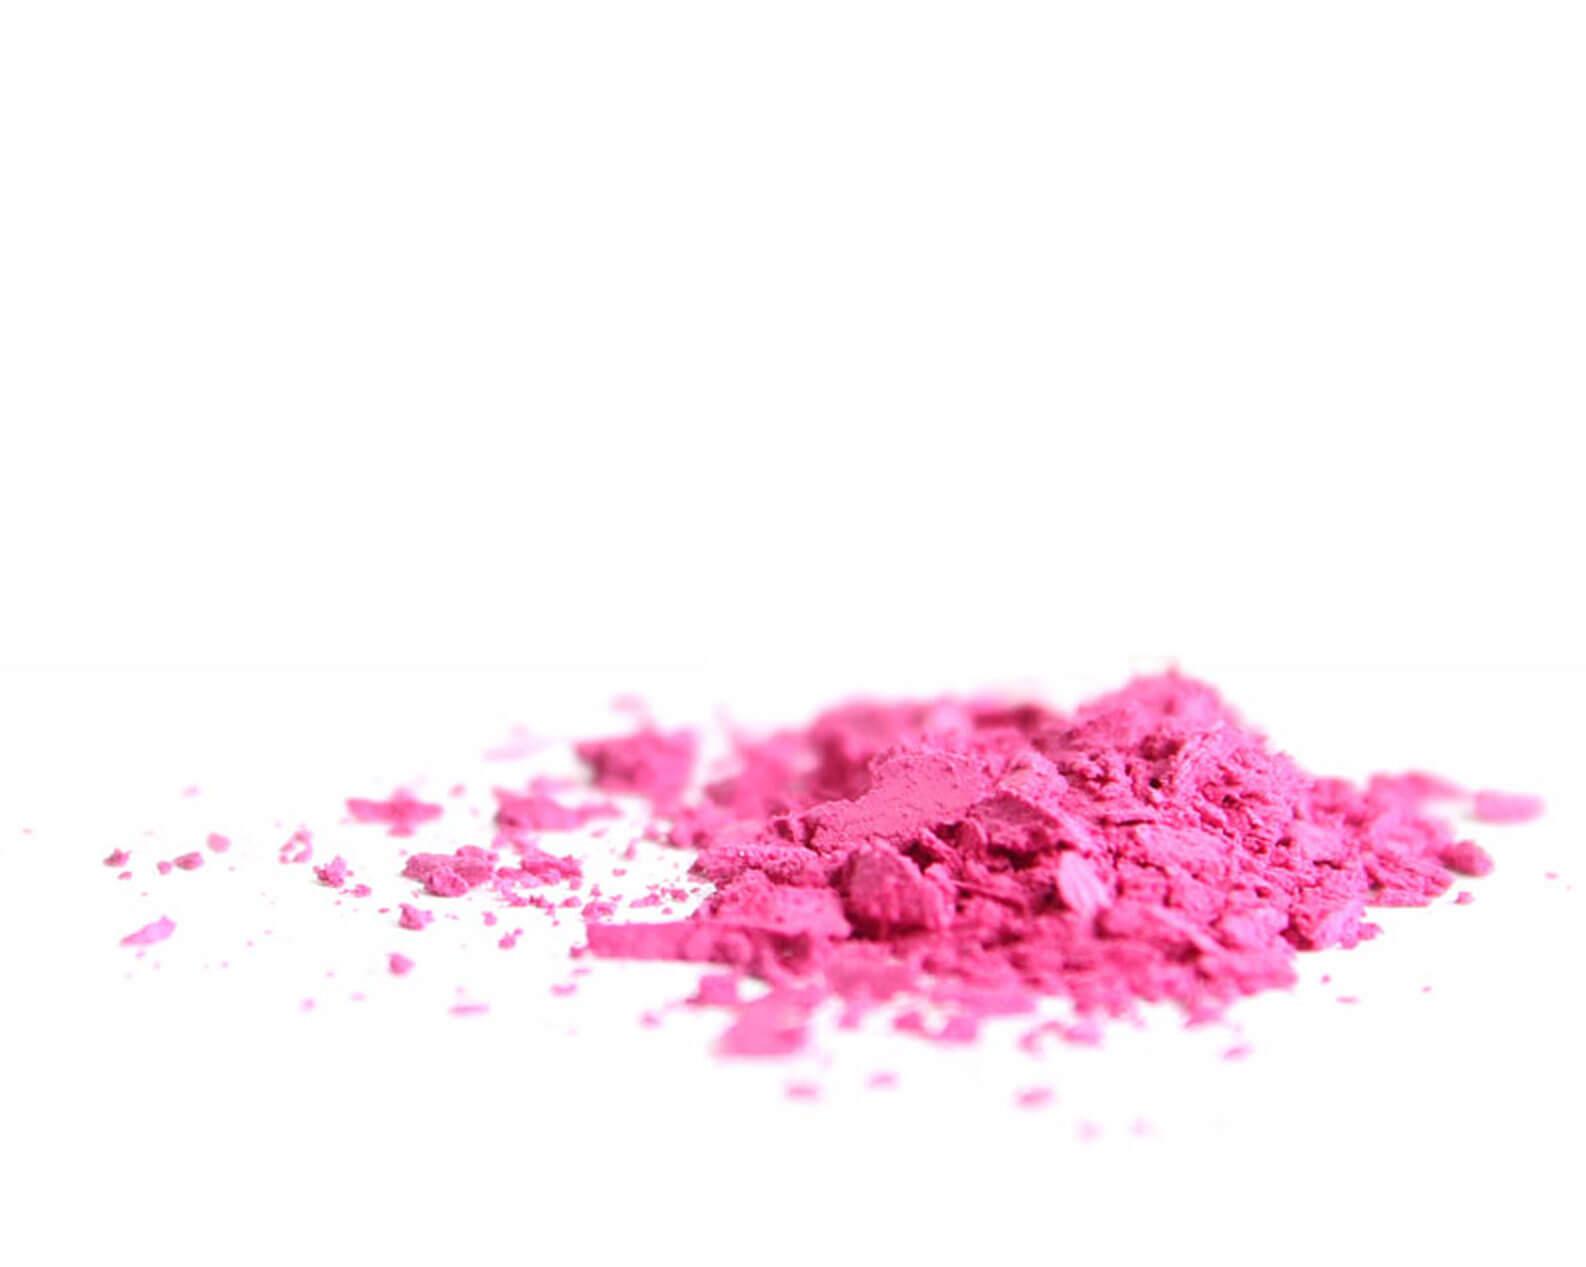 Pink-Makeup-Powder-V2